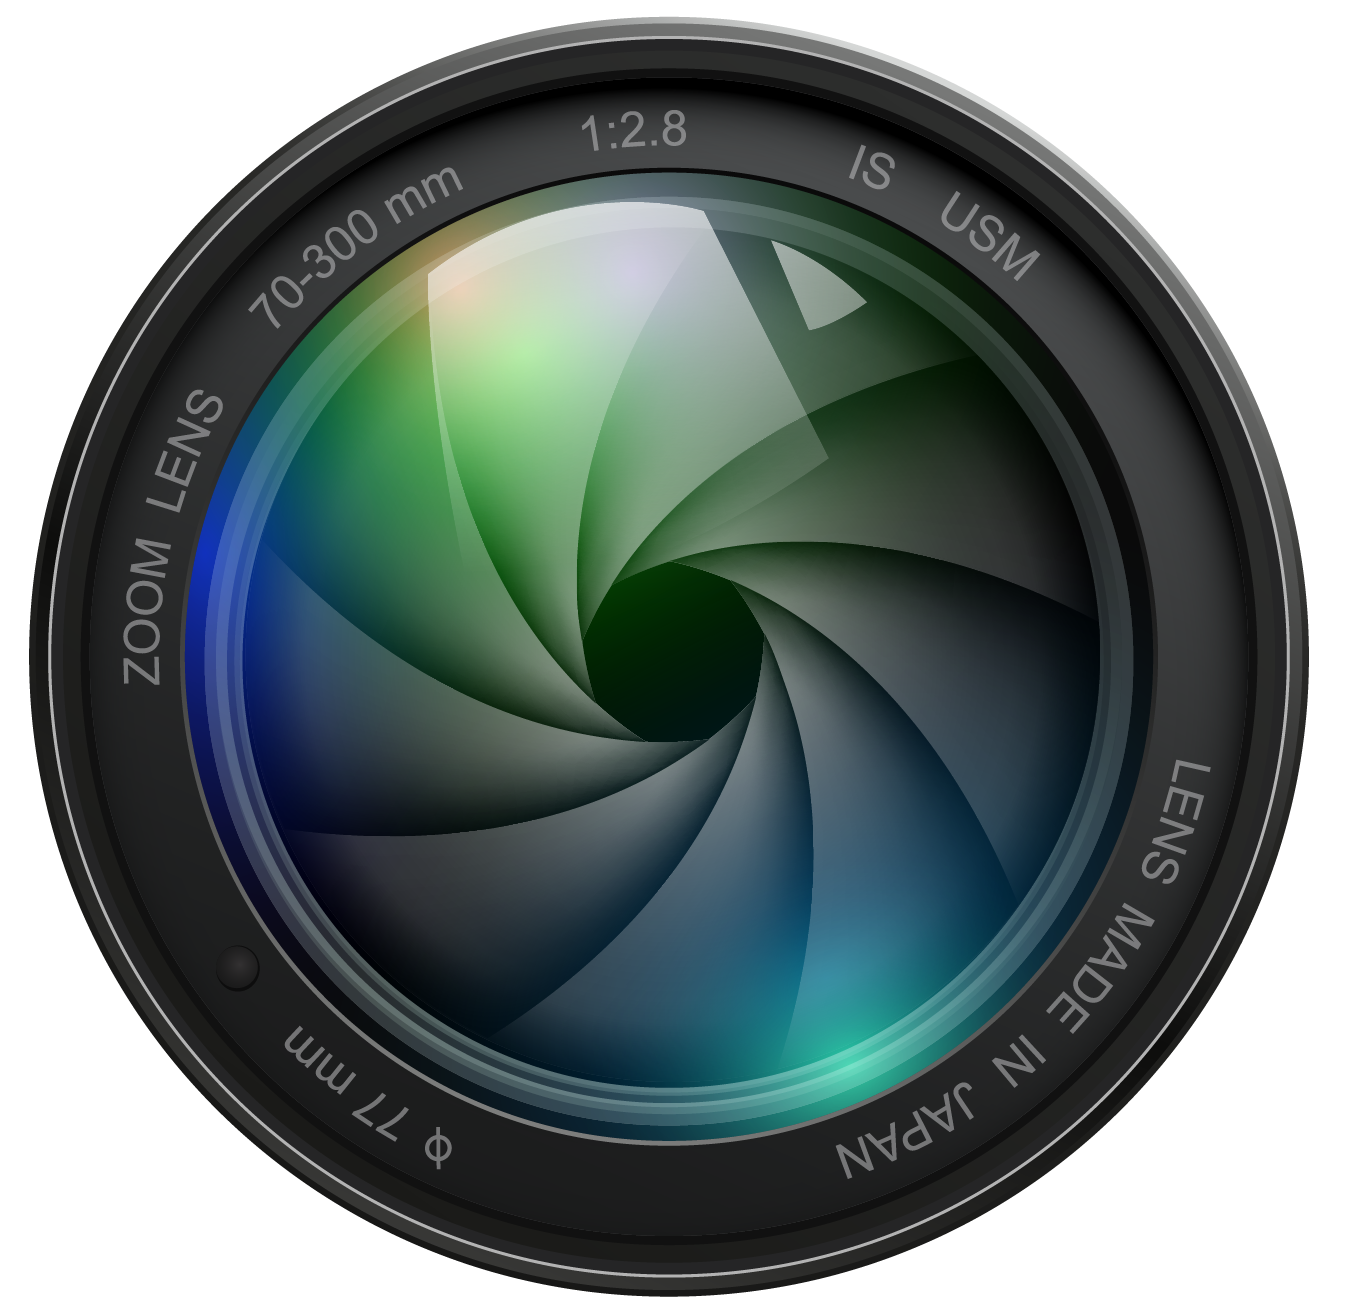 Nikon Unveils 100th Anniversary Collection Anniversary Logo Anniversary The 100